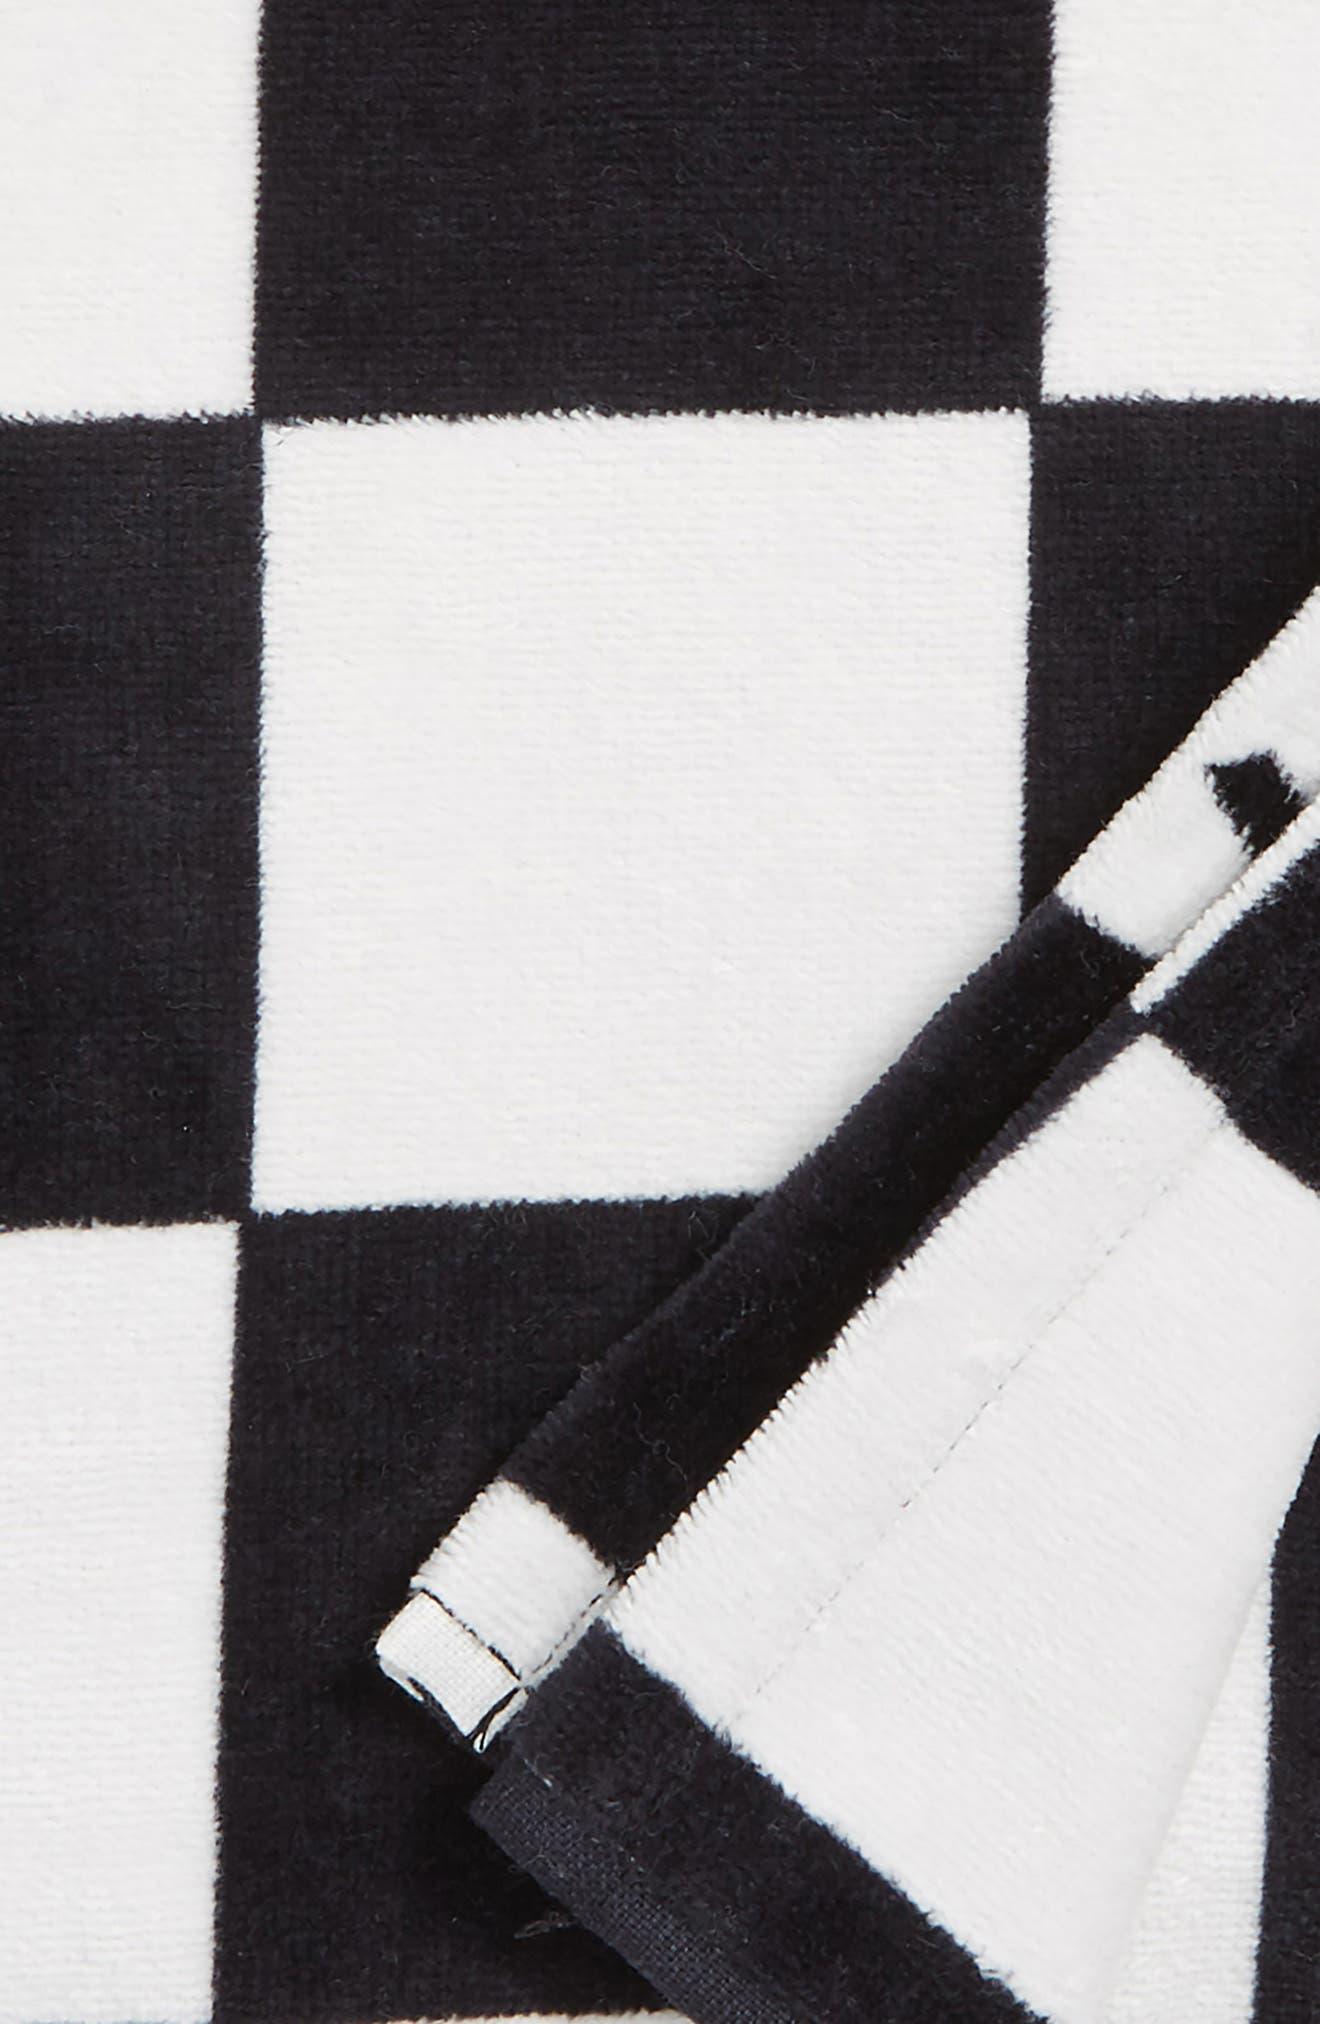 Checkerboard Beach Towel,                             Alternate thumbnail 2, color,                             Black/ White Check